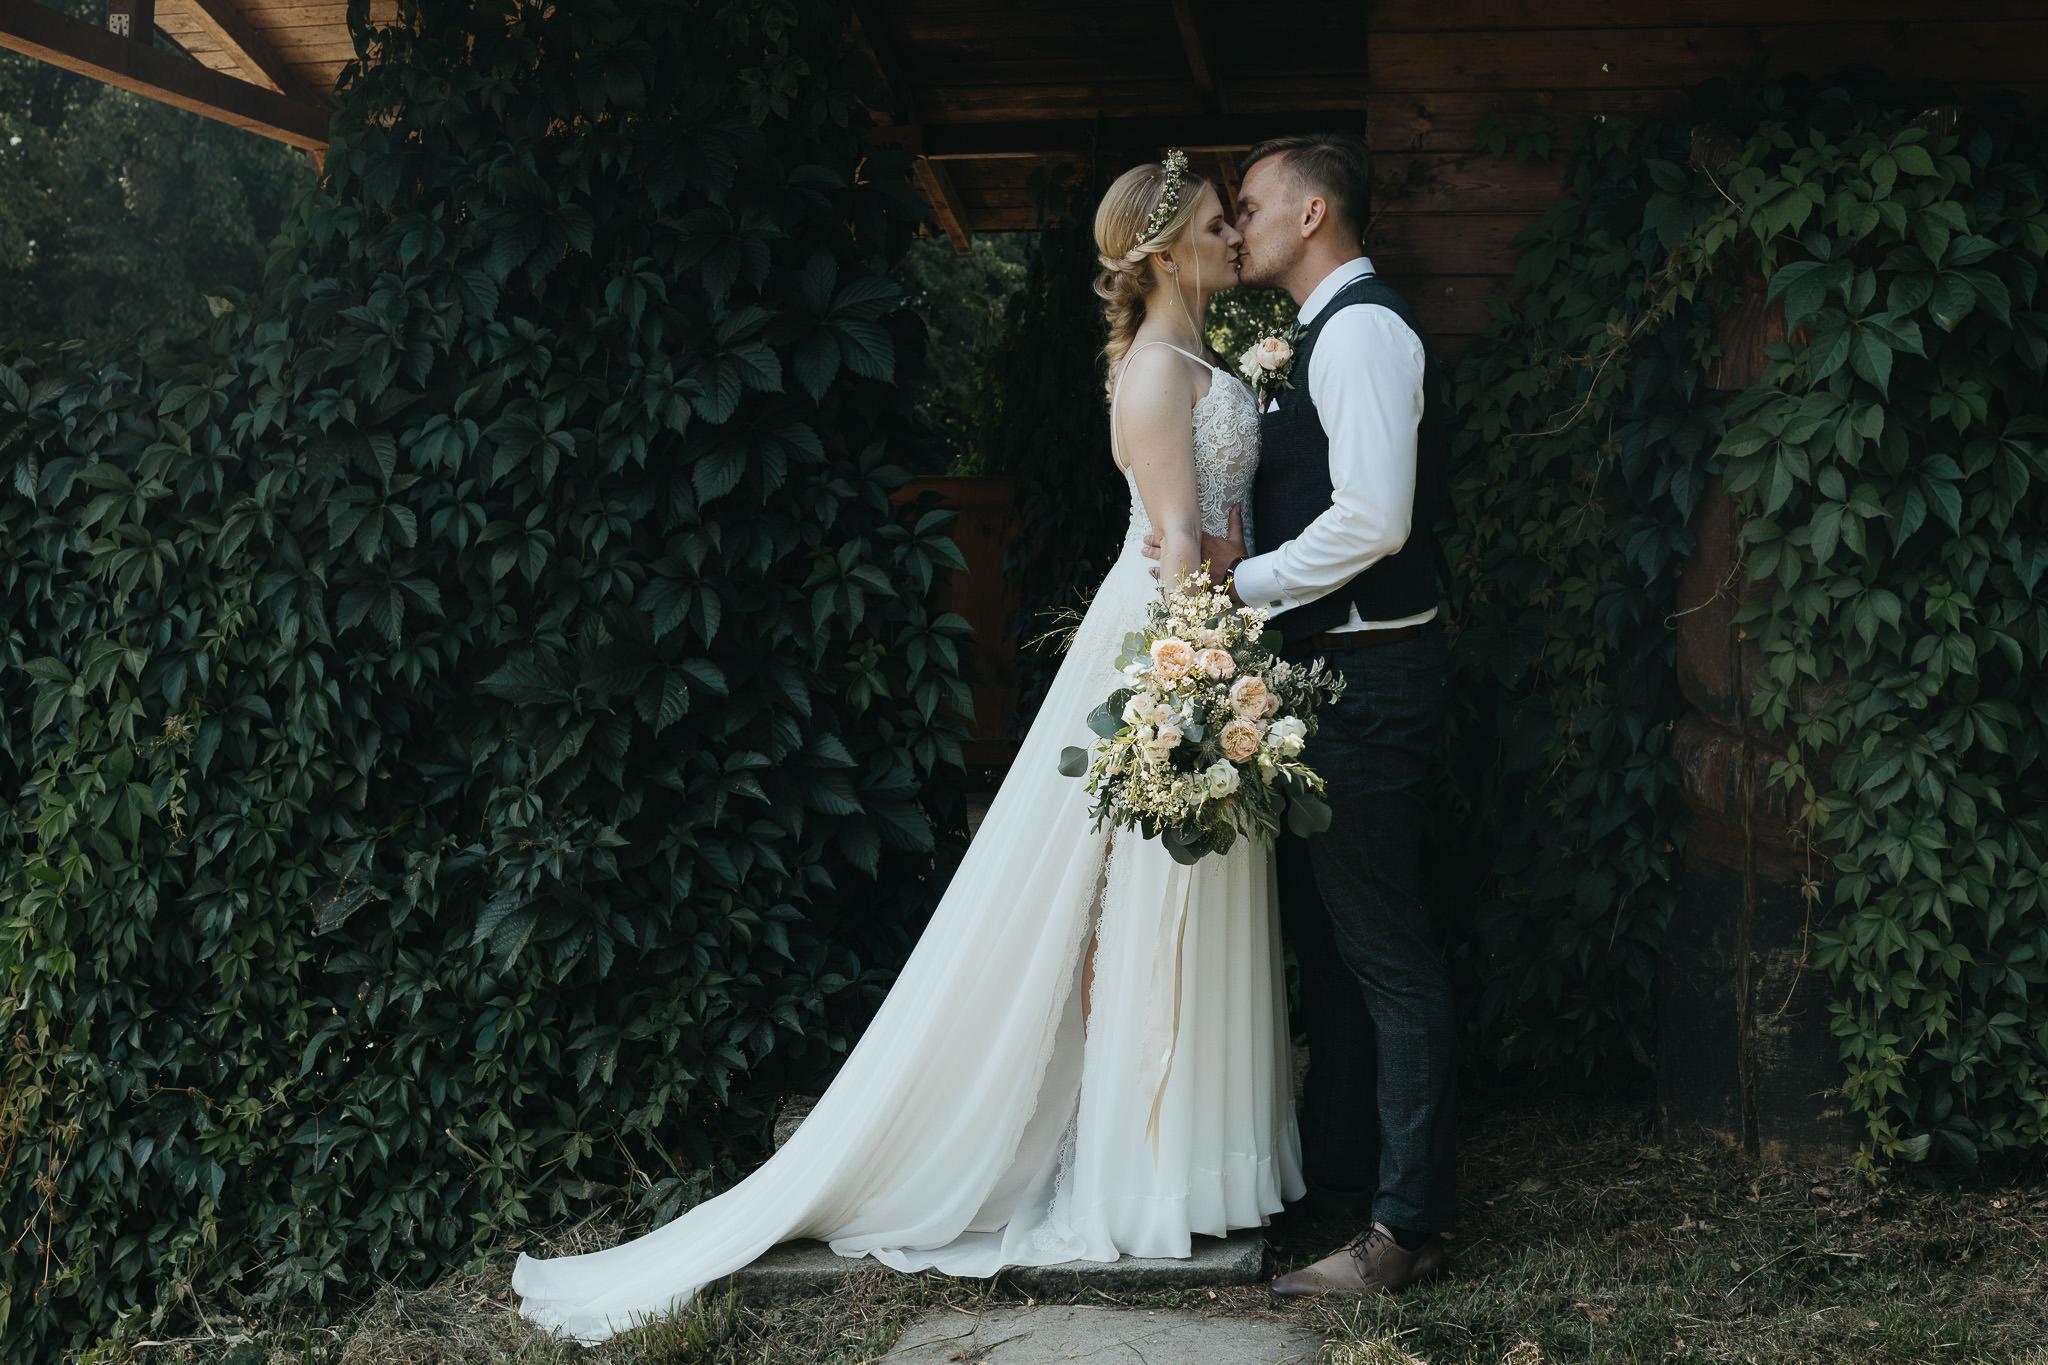 kubousfoto_svatebni_fotograf_brno_wedding_photo_MG_7742